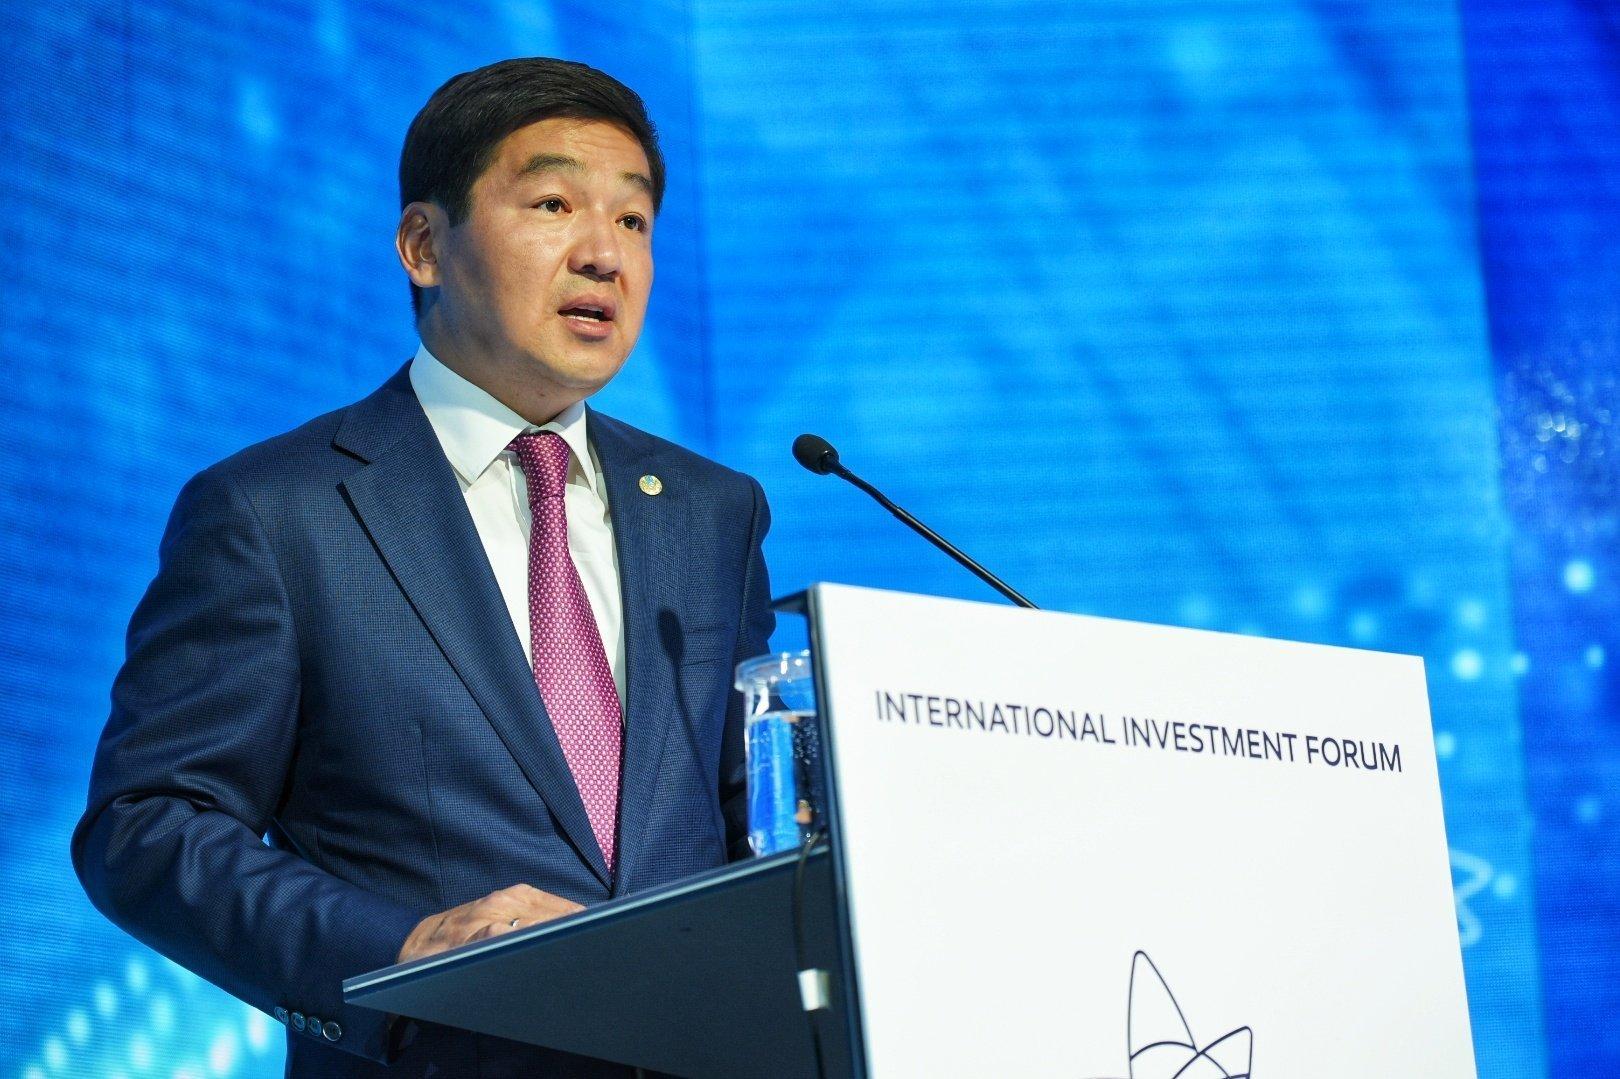 Almaty invest forum